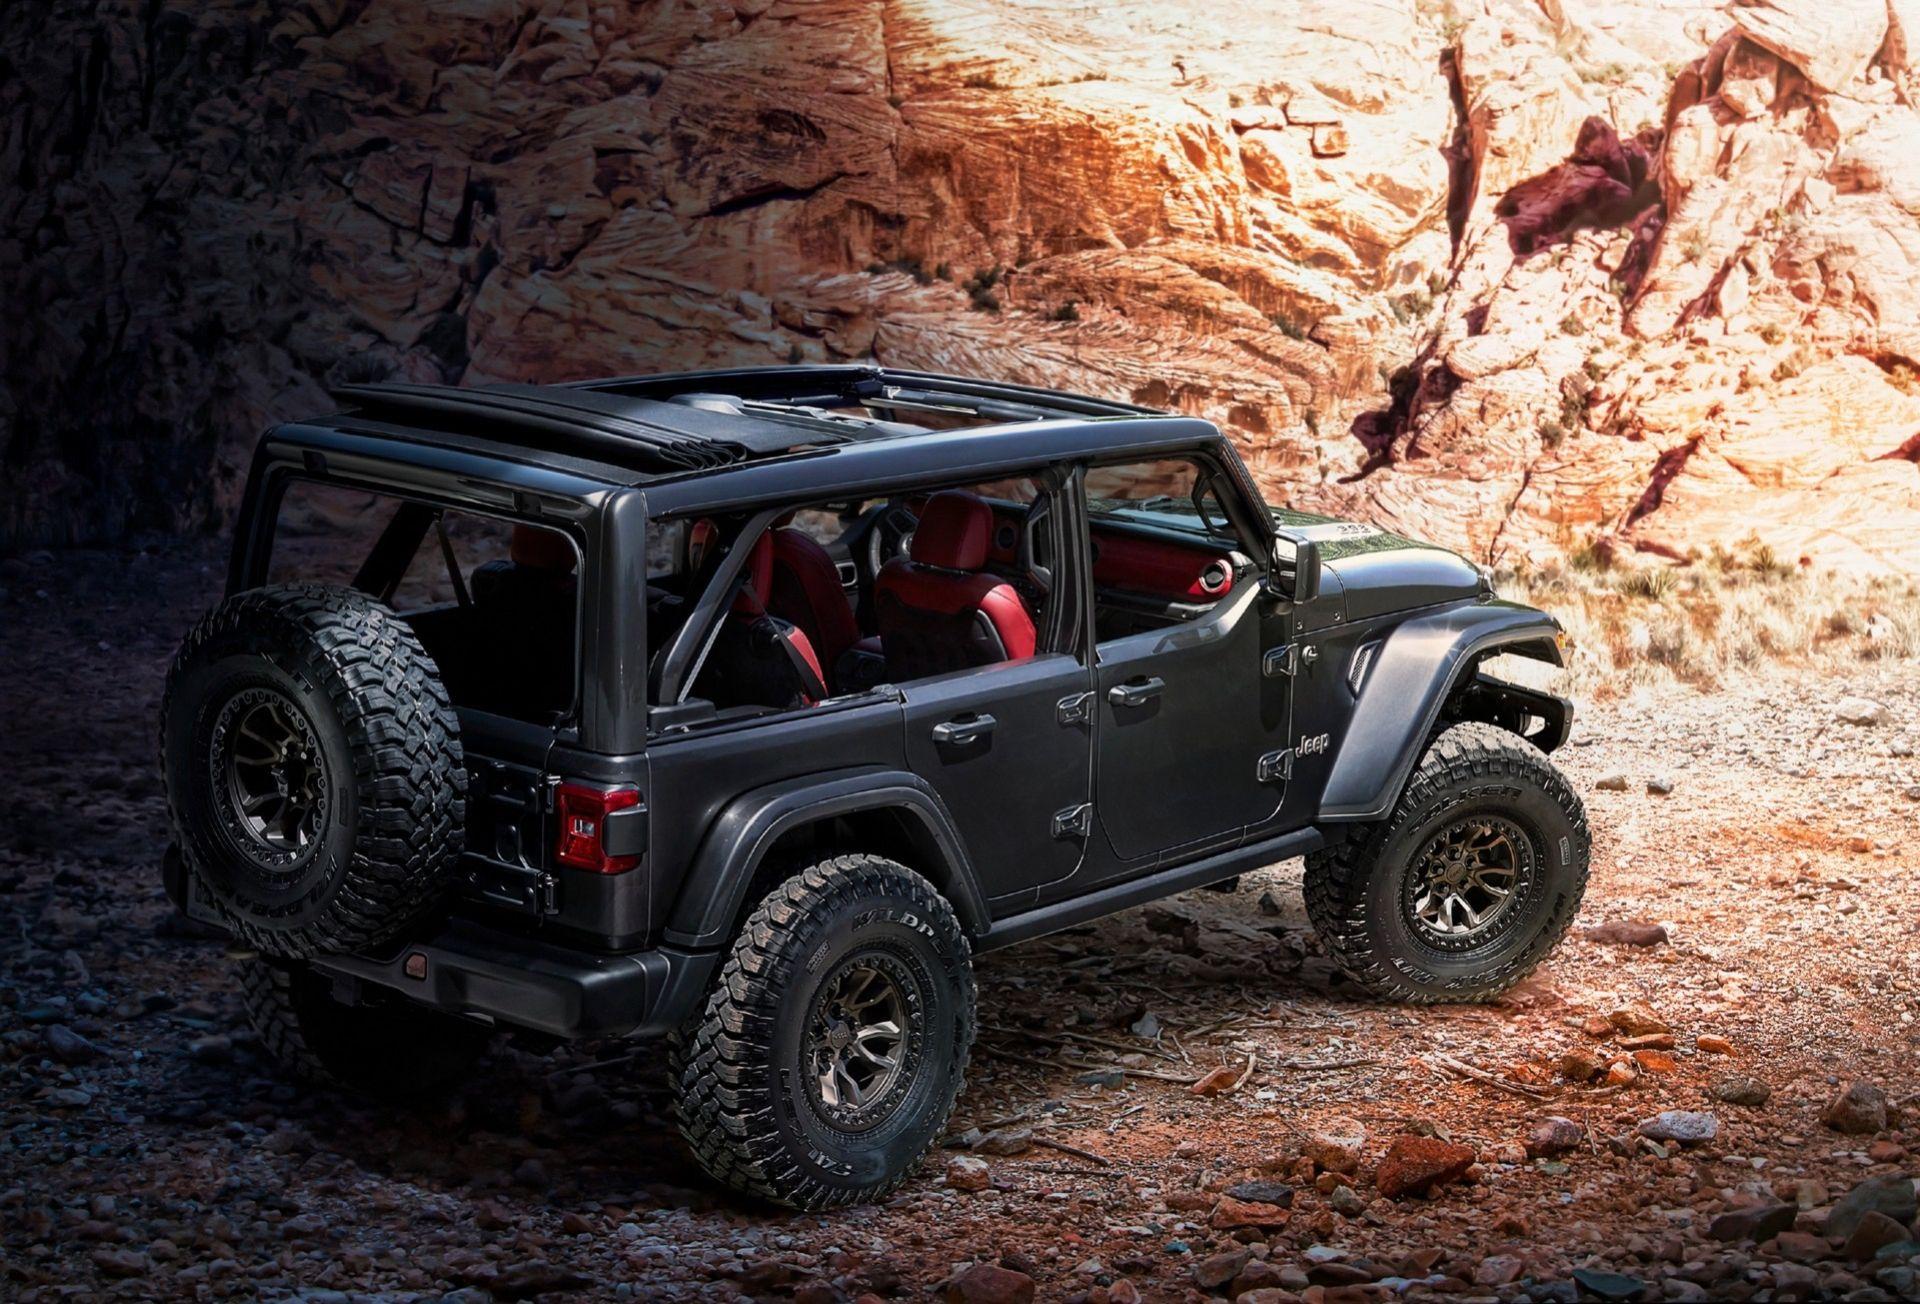 Jeep har stoppat ner V8:a i Wrangler